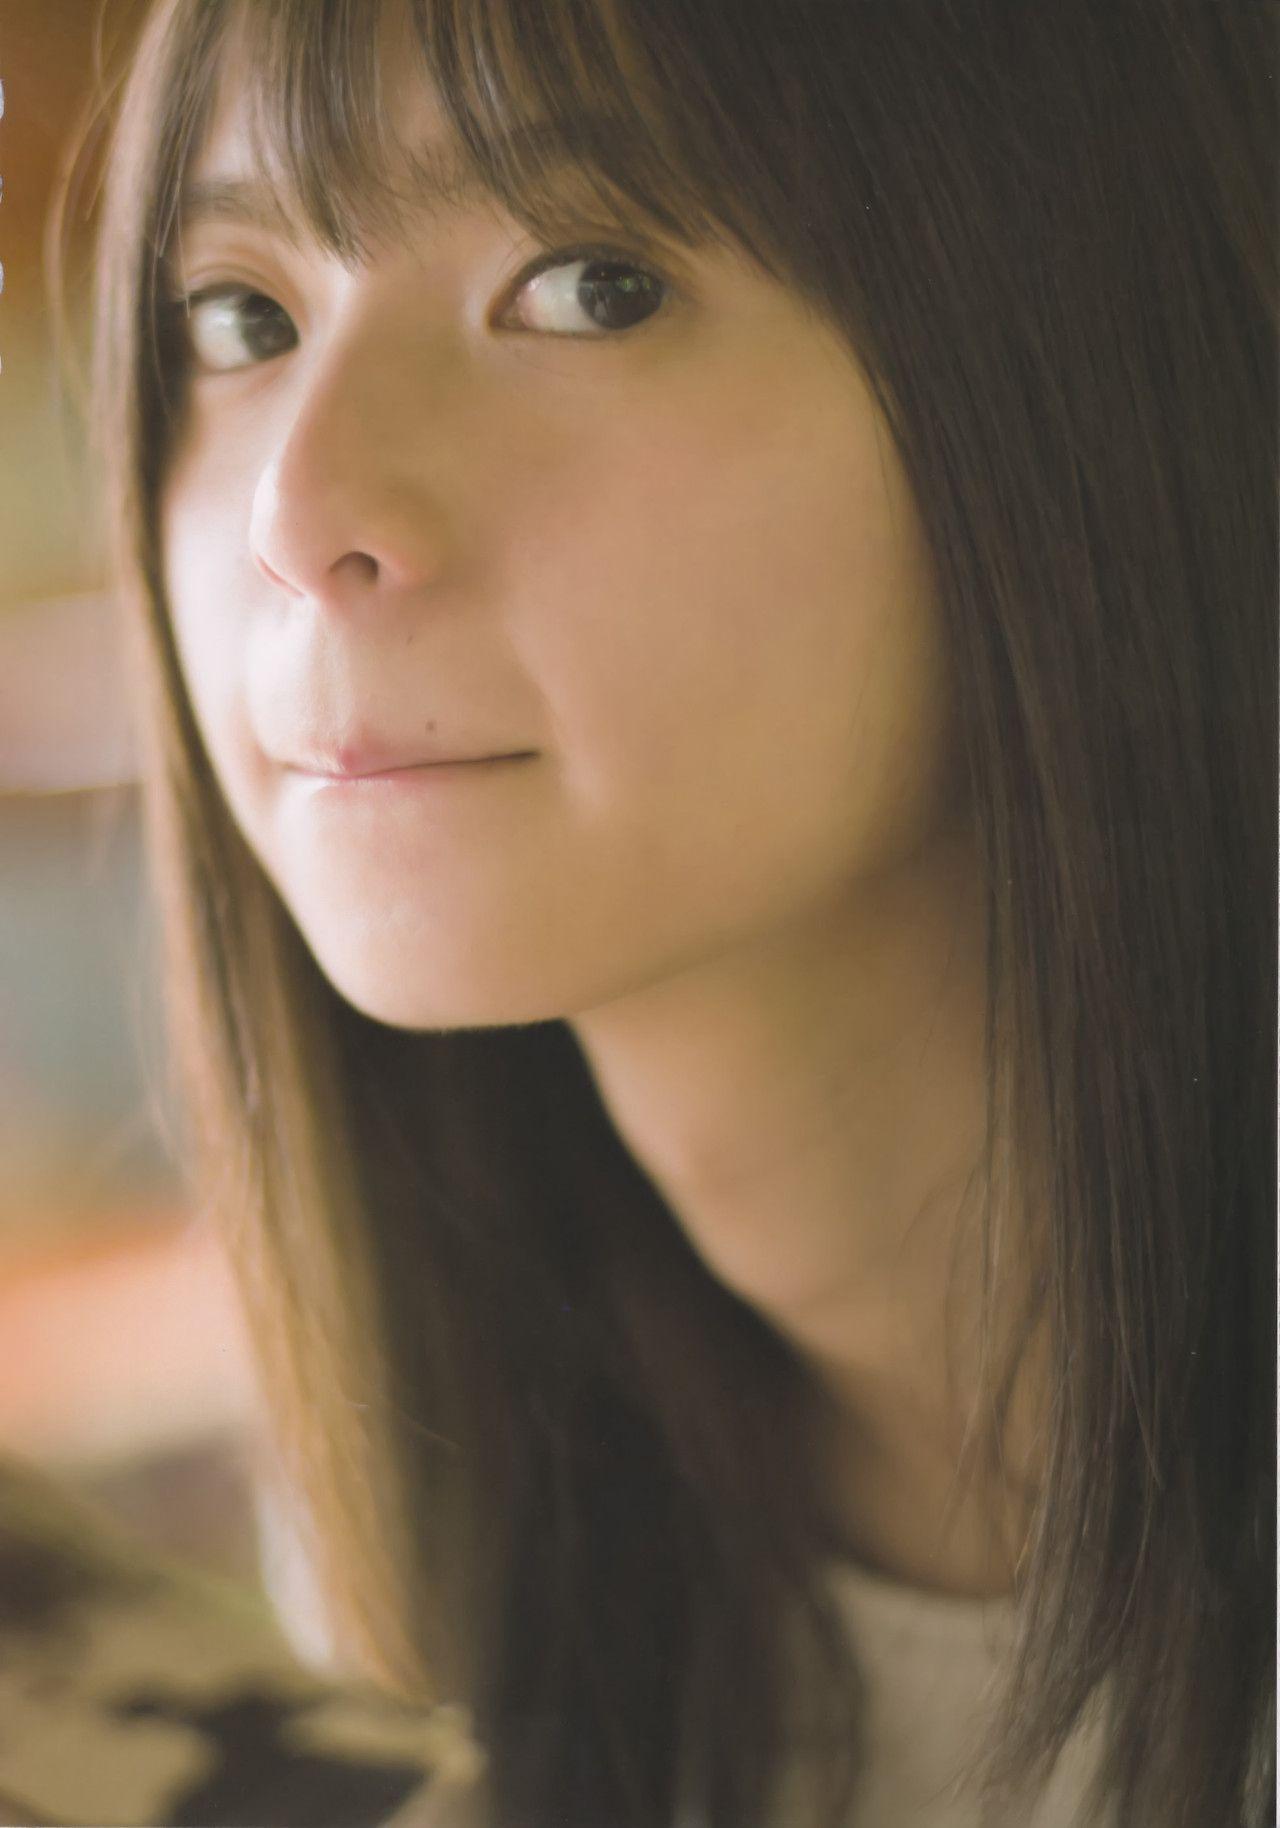 voz48reloaded saito asuka 1st photobook candy pop syndicate 潮騒 飛鳥 齋藤飛鳥